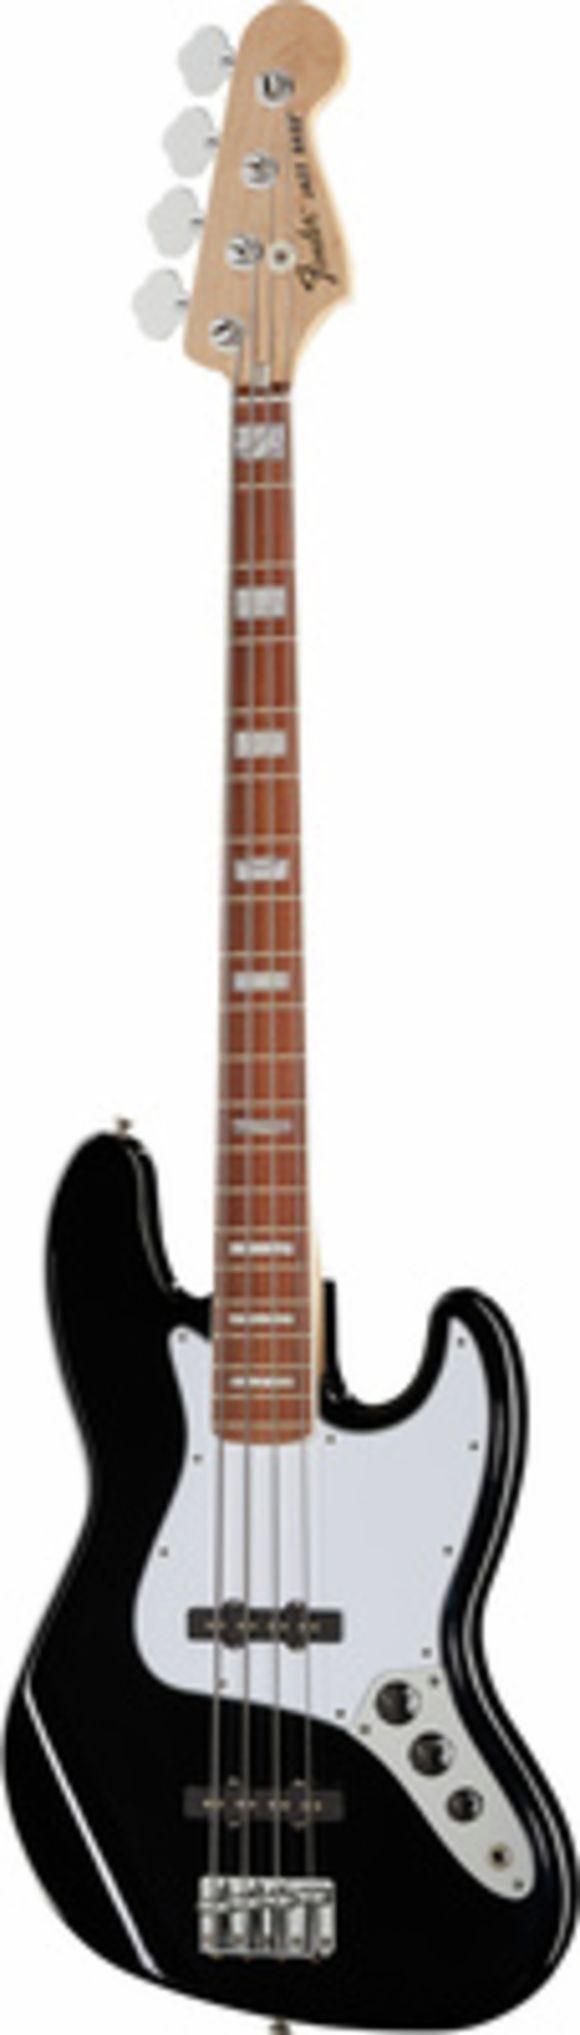 70 Classic Jazz Bass PF BK Fender